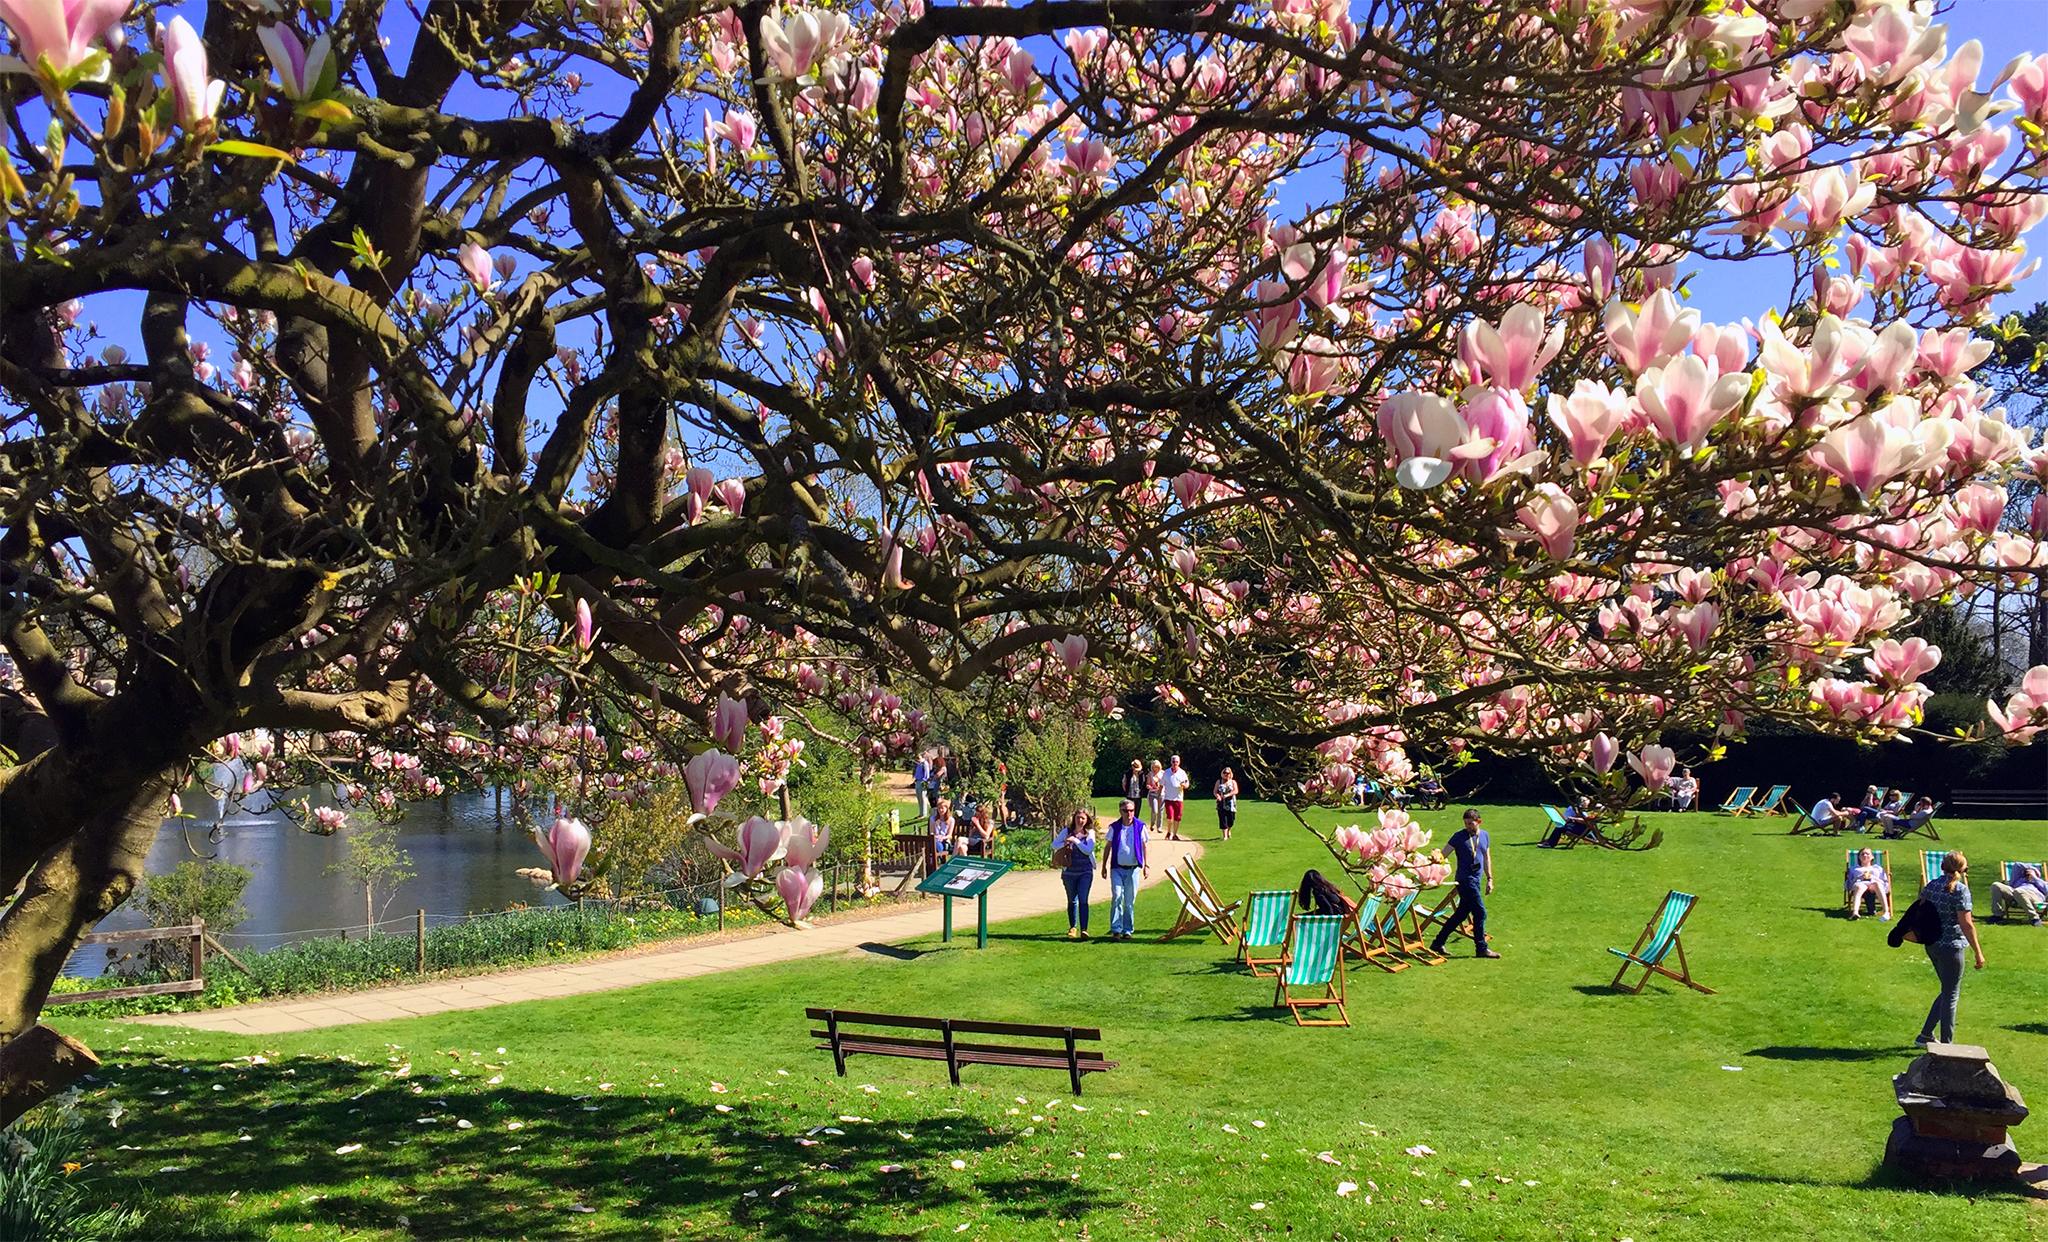 Bletchey Park, Inglaterra bletchley park - 38784607682 d3d46c515d o - Bletchley Park, el secreto mejor guardado de Inglaterra